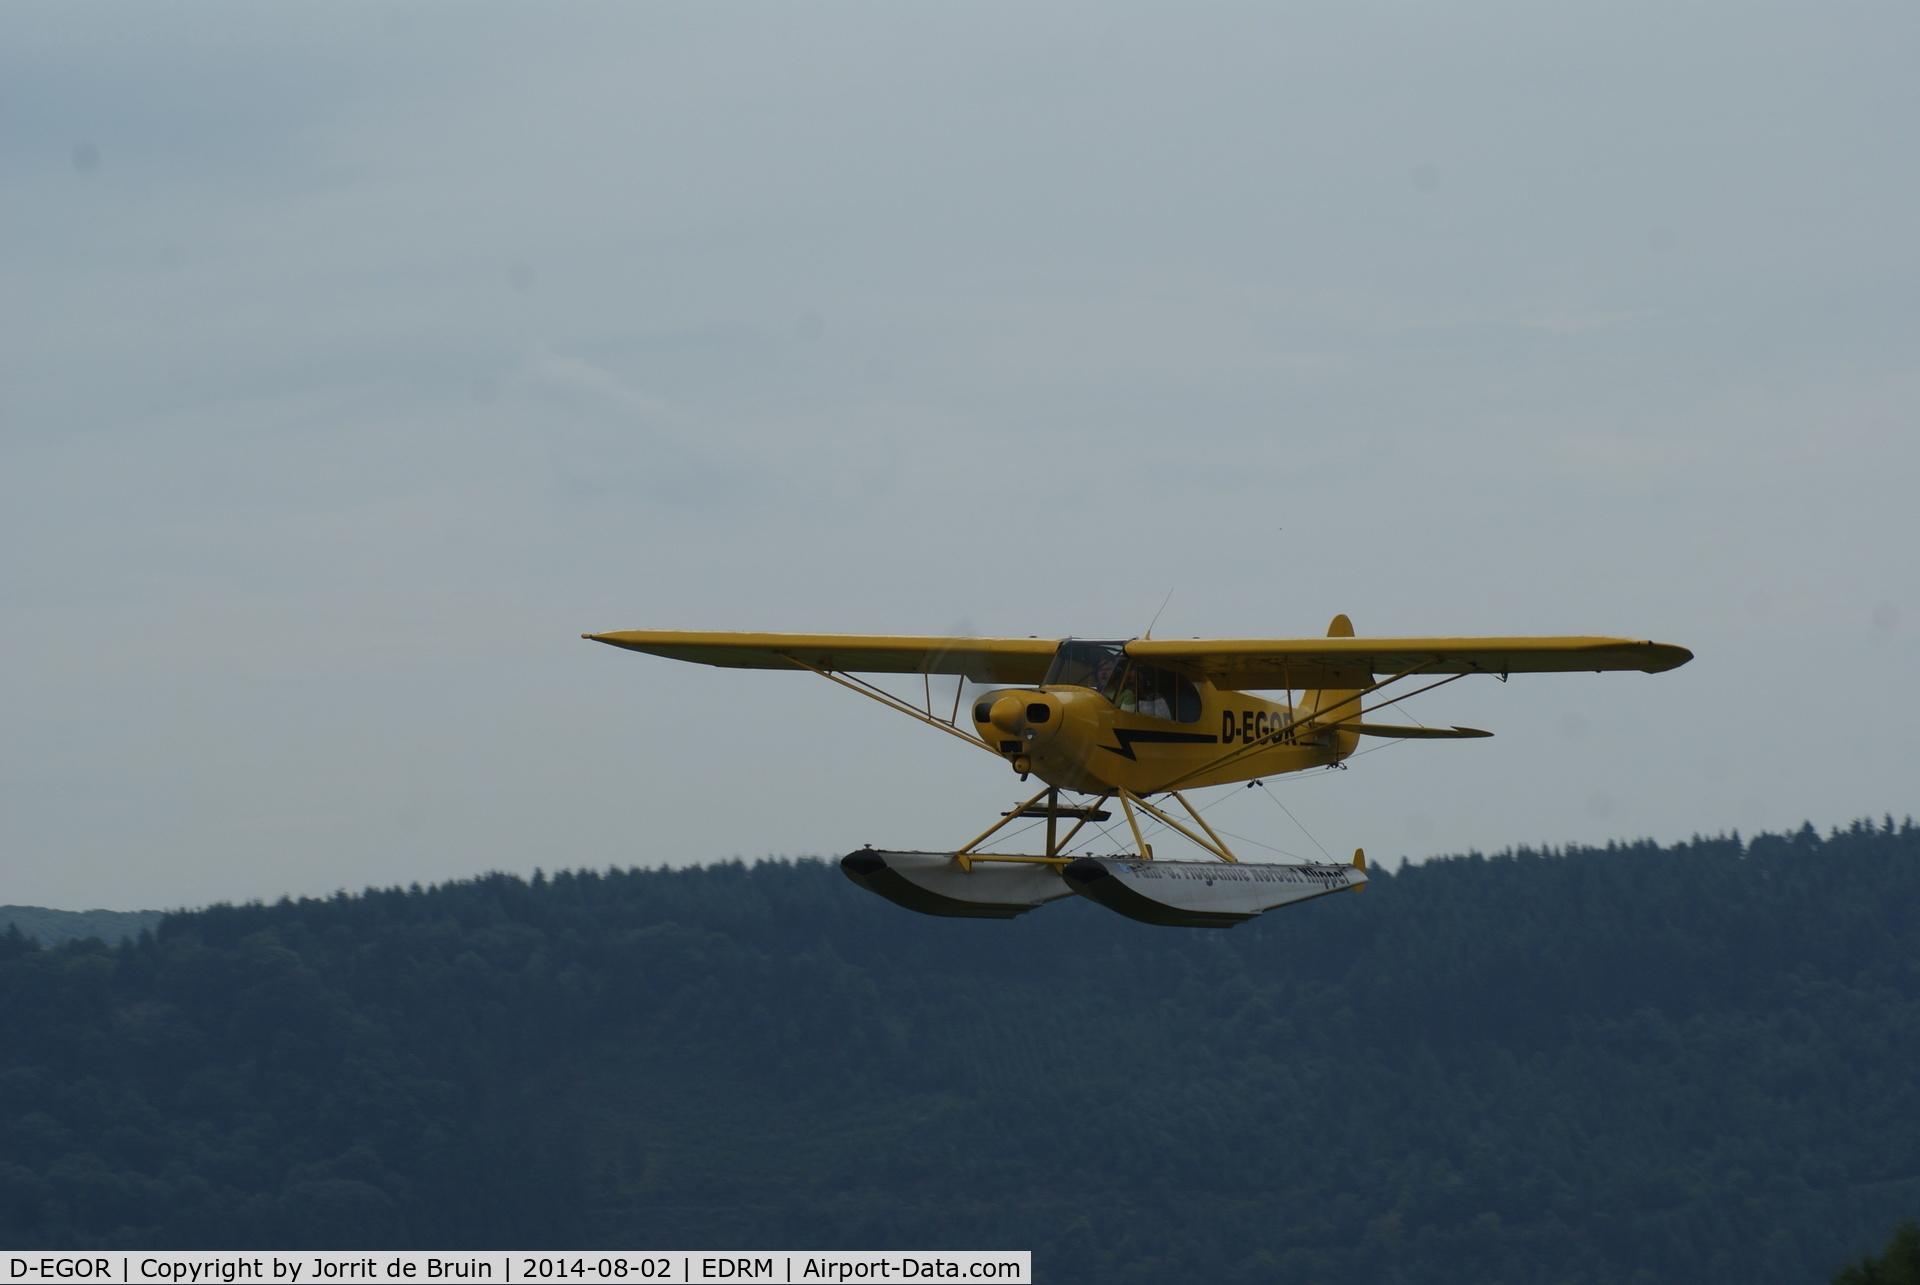 D-EGOR, Piper L-4H Grasshopper (J3C-65D) C/N 10668, Während des Flugplatzfest auf dem Mont-Royal Traben-Trarbach Flugplatz. - During the Flugplatzfest on the Mont-Royal Traben-Trarbach airport.